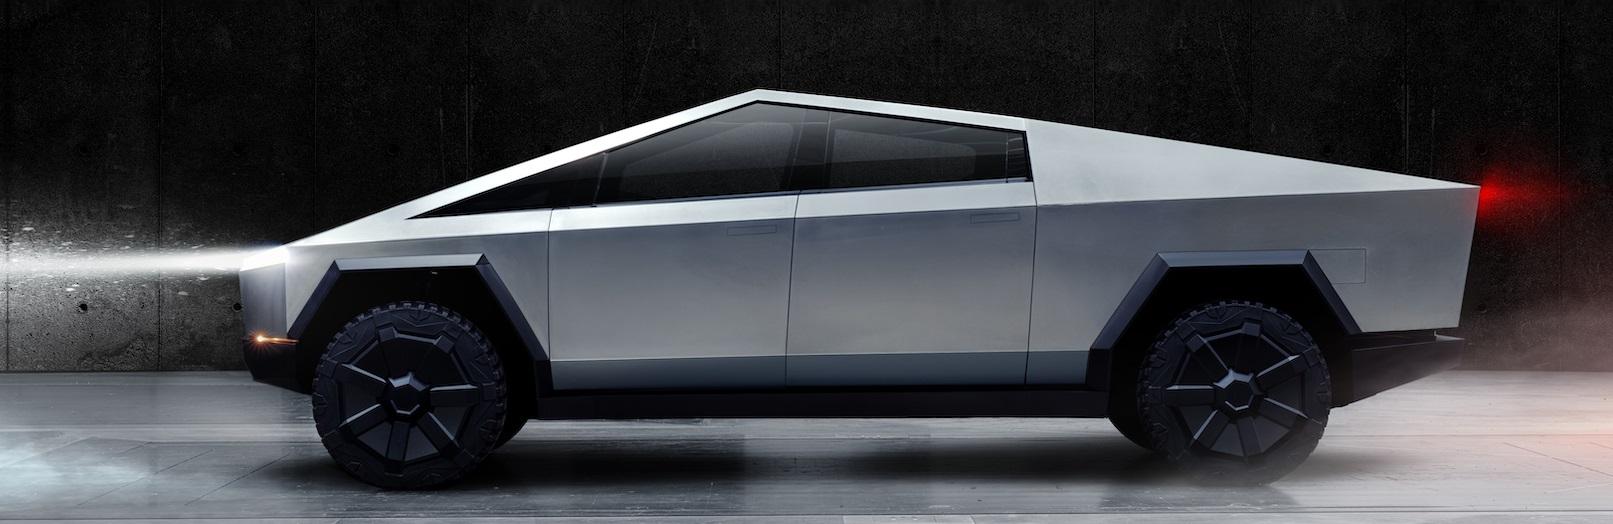 Tesla Cybertruck electric vehicle side view